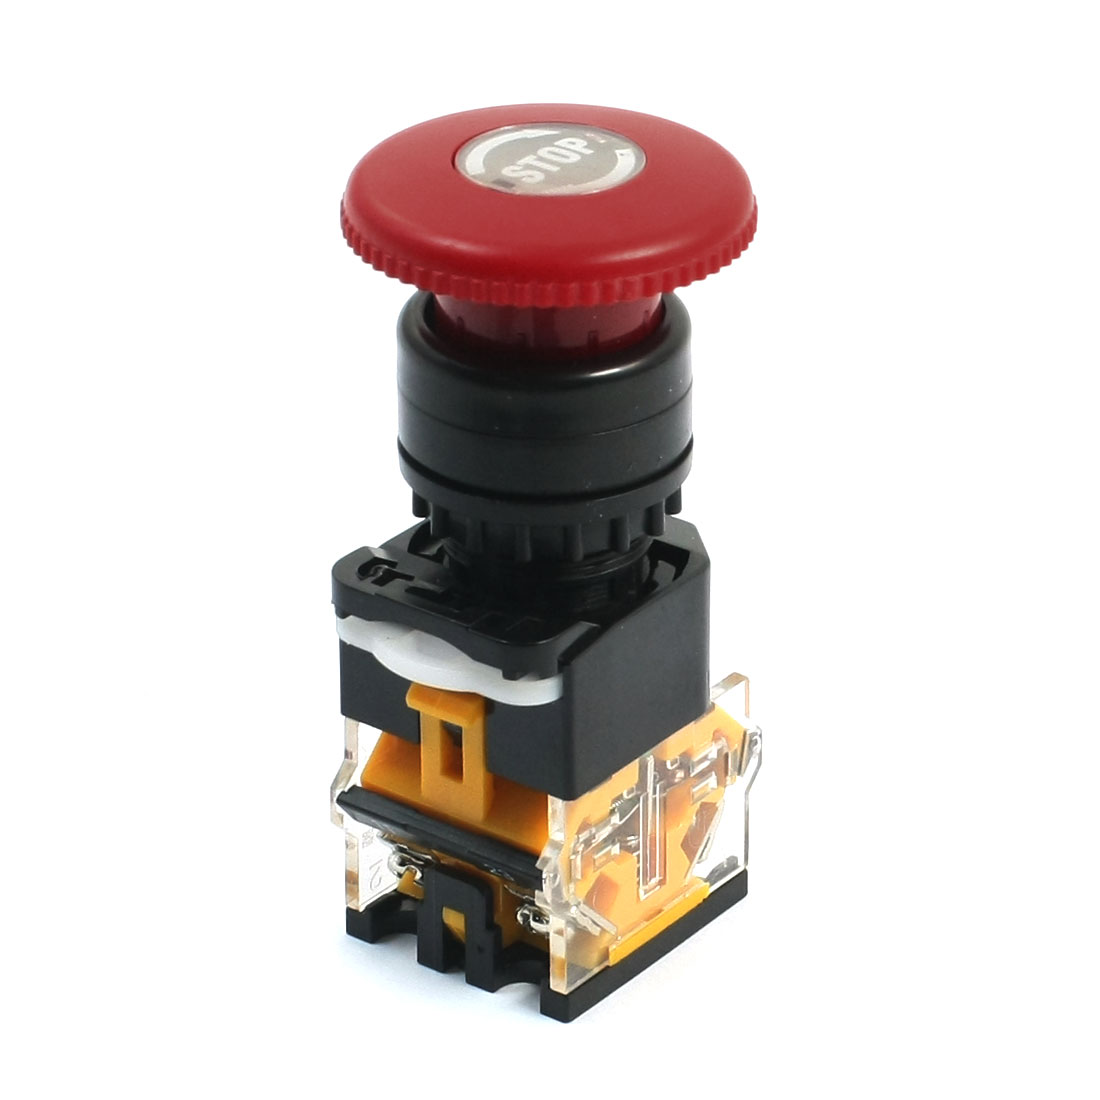 380V 10A DPST 1NO 1NC Circuit Control Self-Locking Mushroom Pushbutton Switch